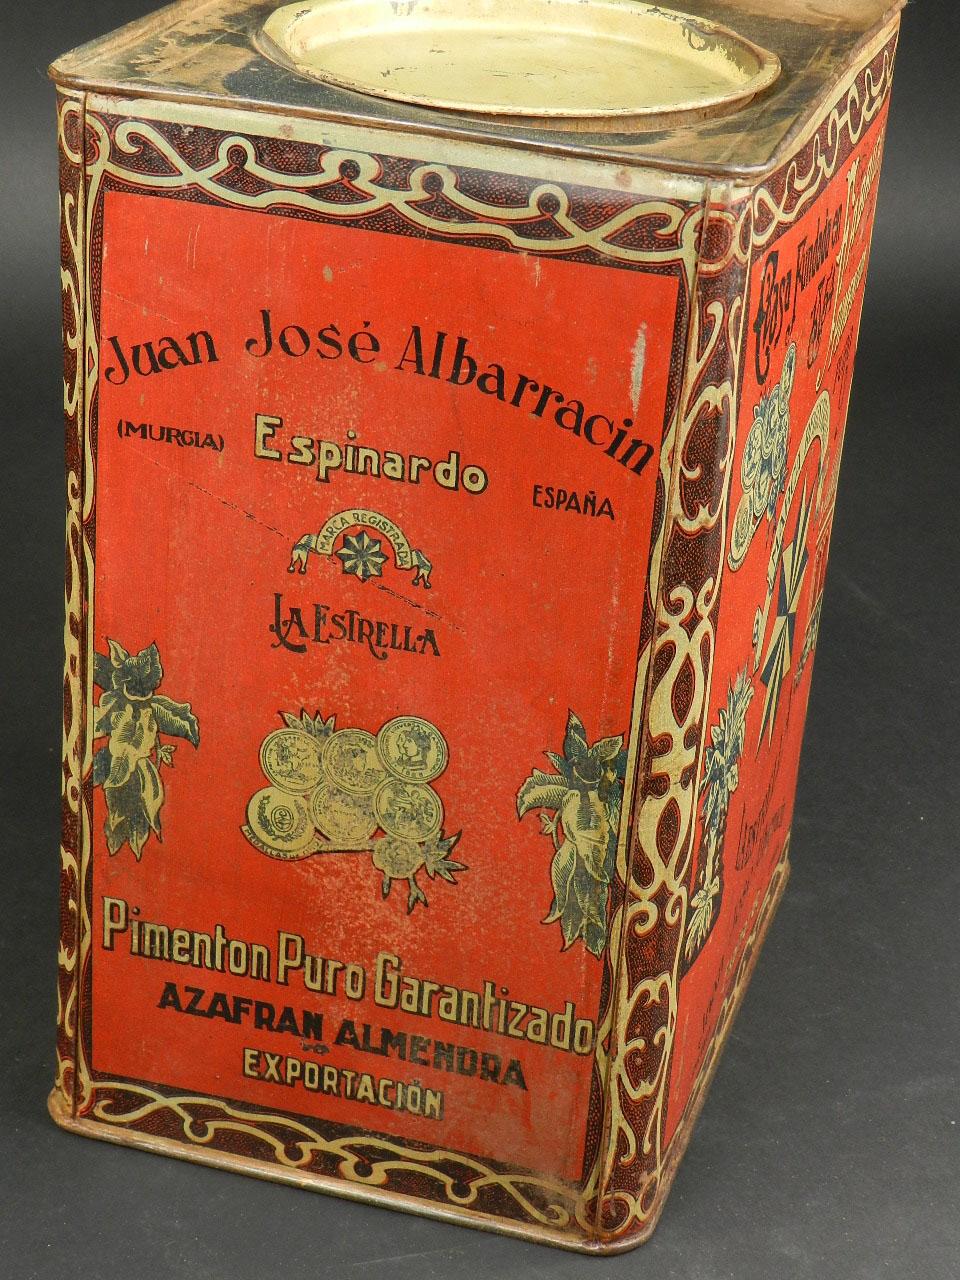 Imagen LATA DE PIMENTON LA ESTRELLA, MURCIA AÑO 1920 24658